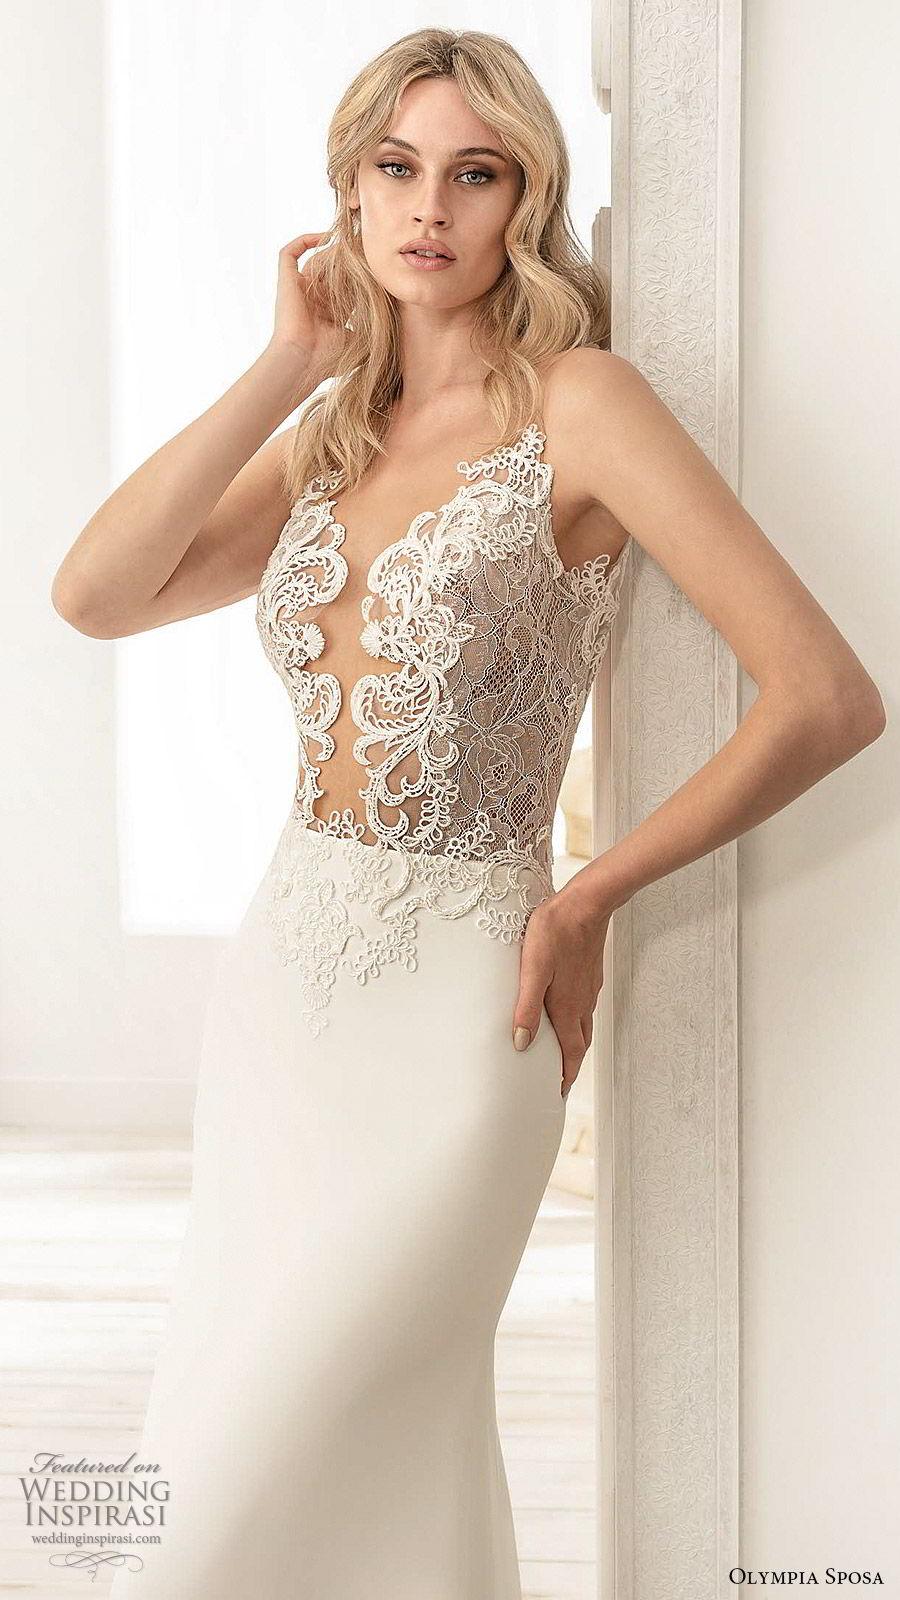 olympia sposa 2020 bridal sleeveless illusion straps plunging v neckline sheer embellished bodice sheath wedding dress (6) elegant sexy low back chapel train zv